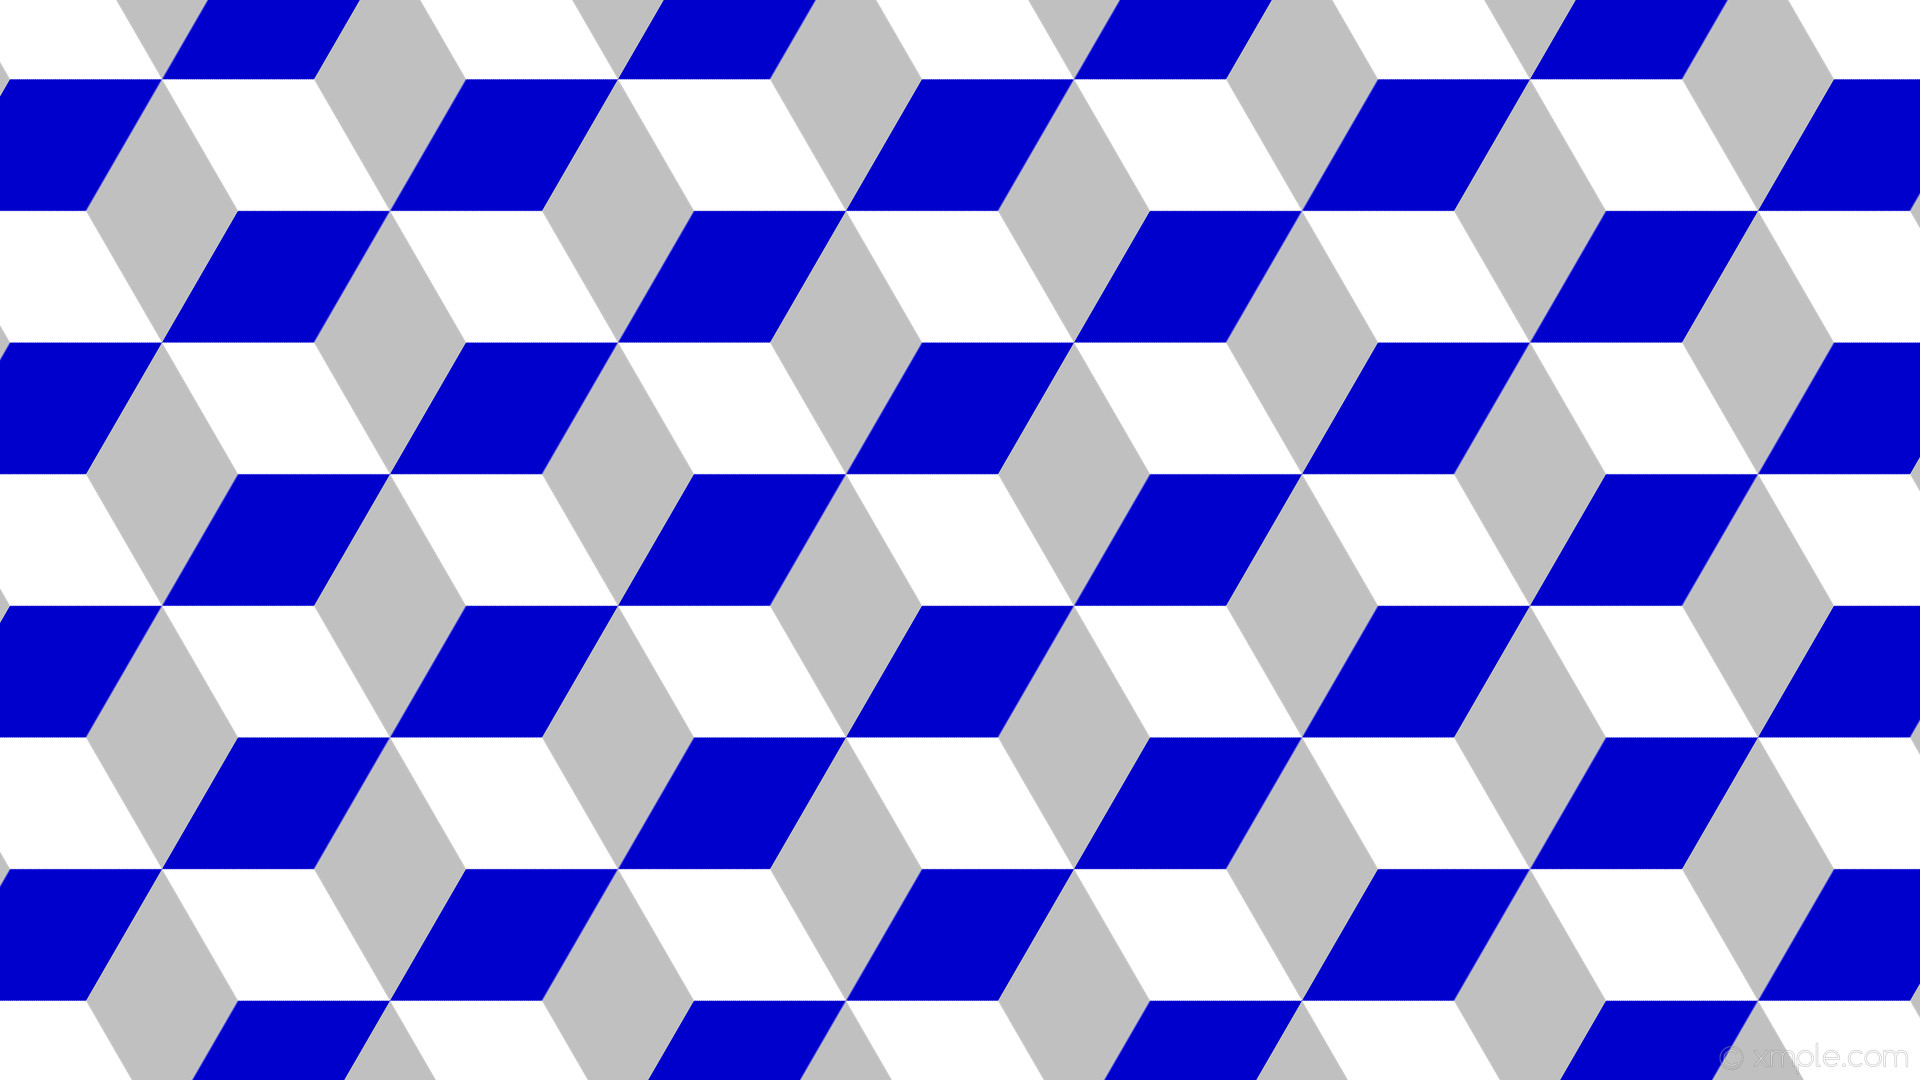 wallpaper blue grey 3d cubes white silver medium blue #ffffff #c0c0c0  #0000cd 330